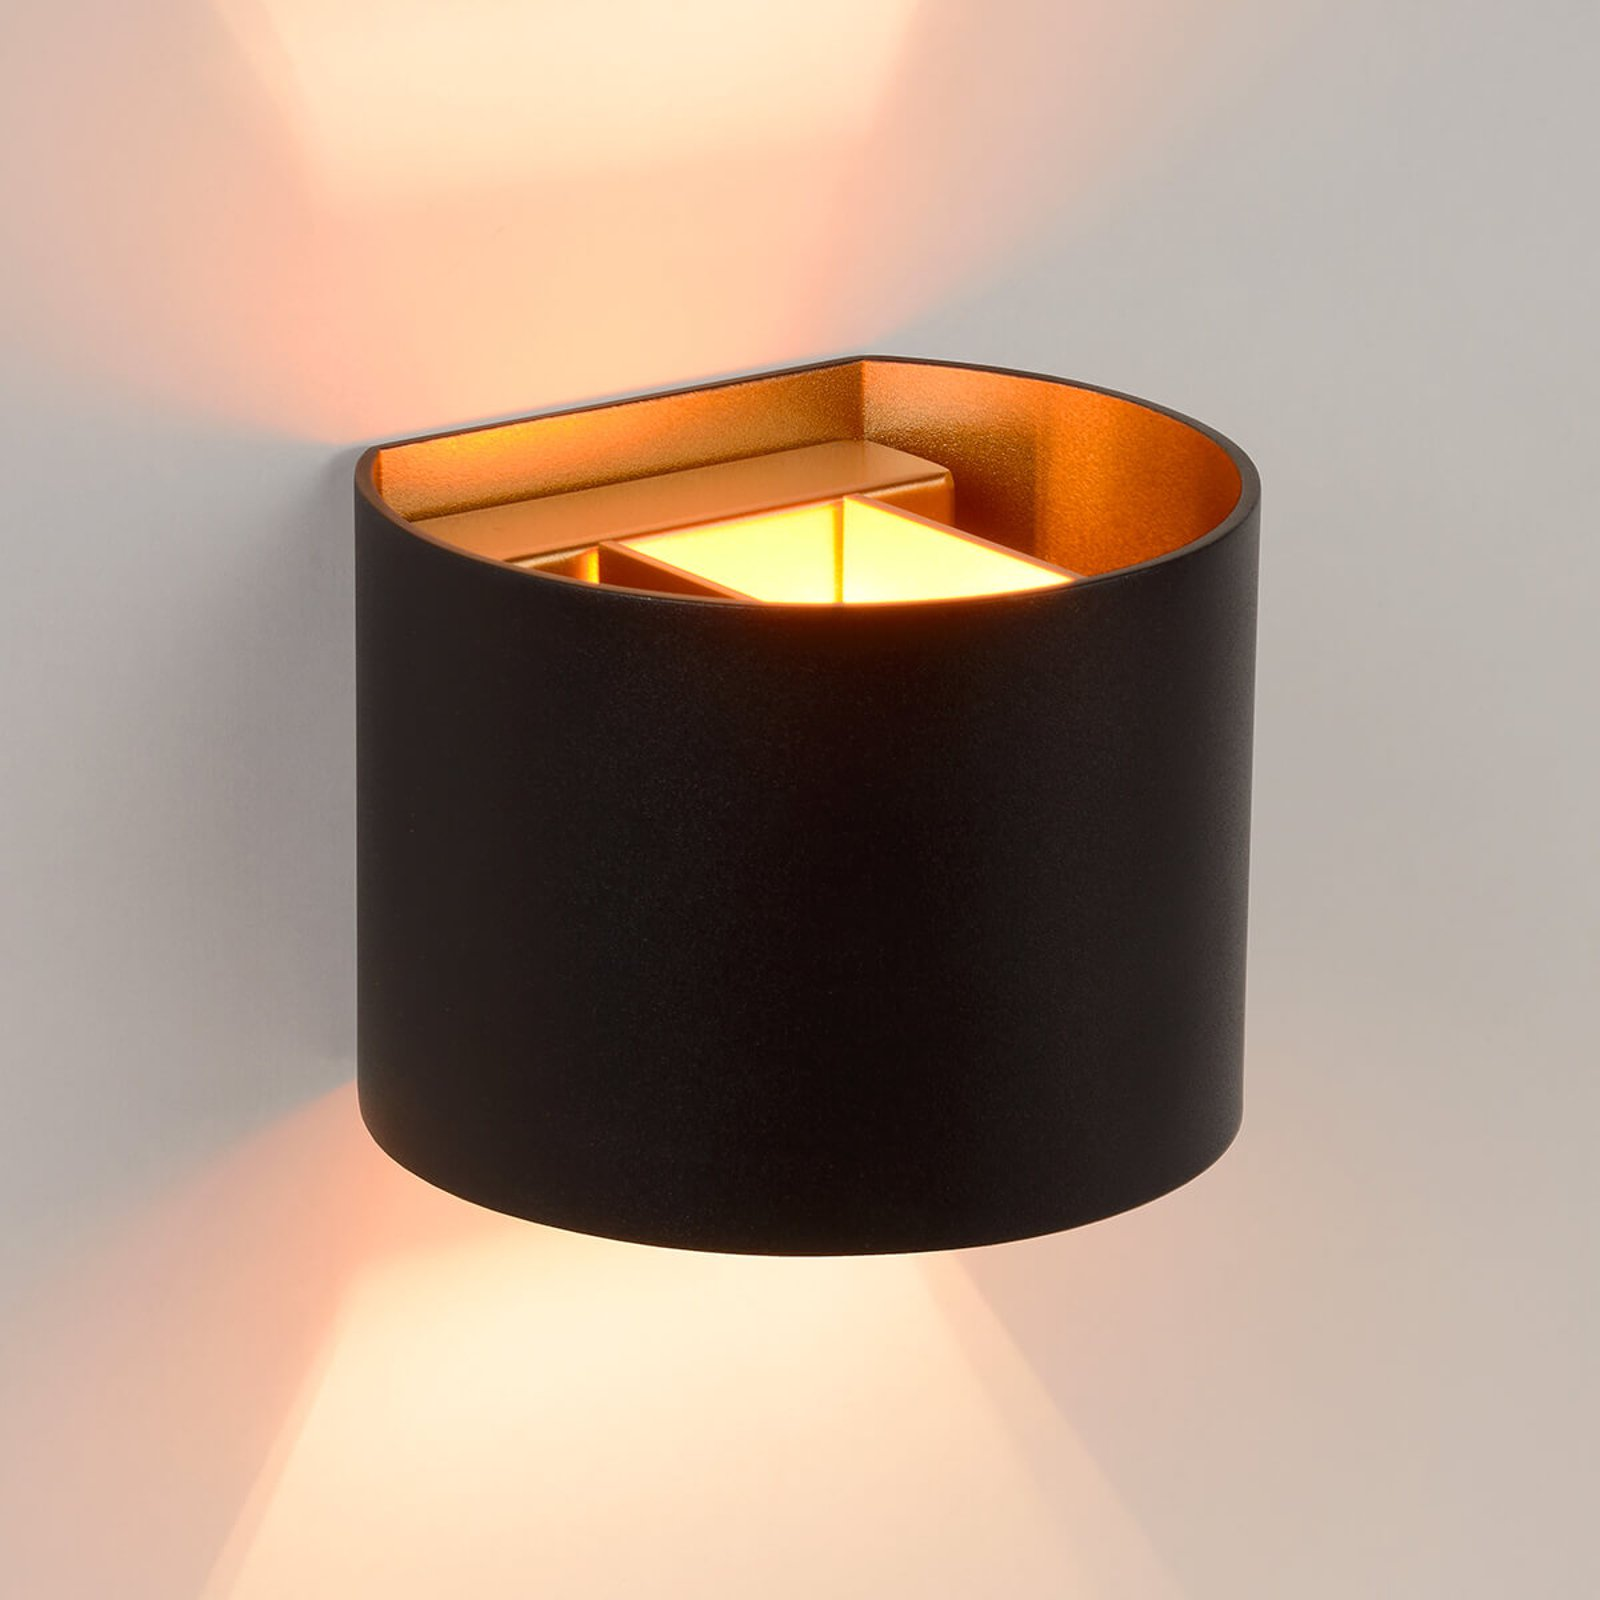 Halvrund LED-vegglampe Xio i svart